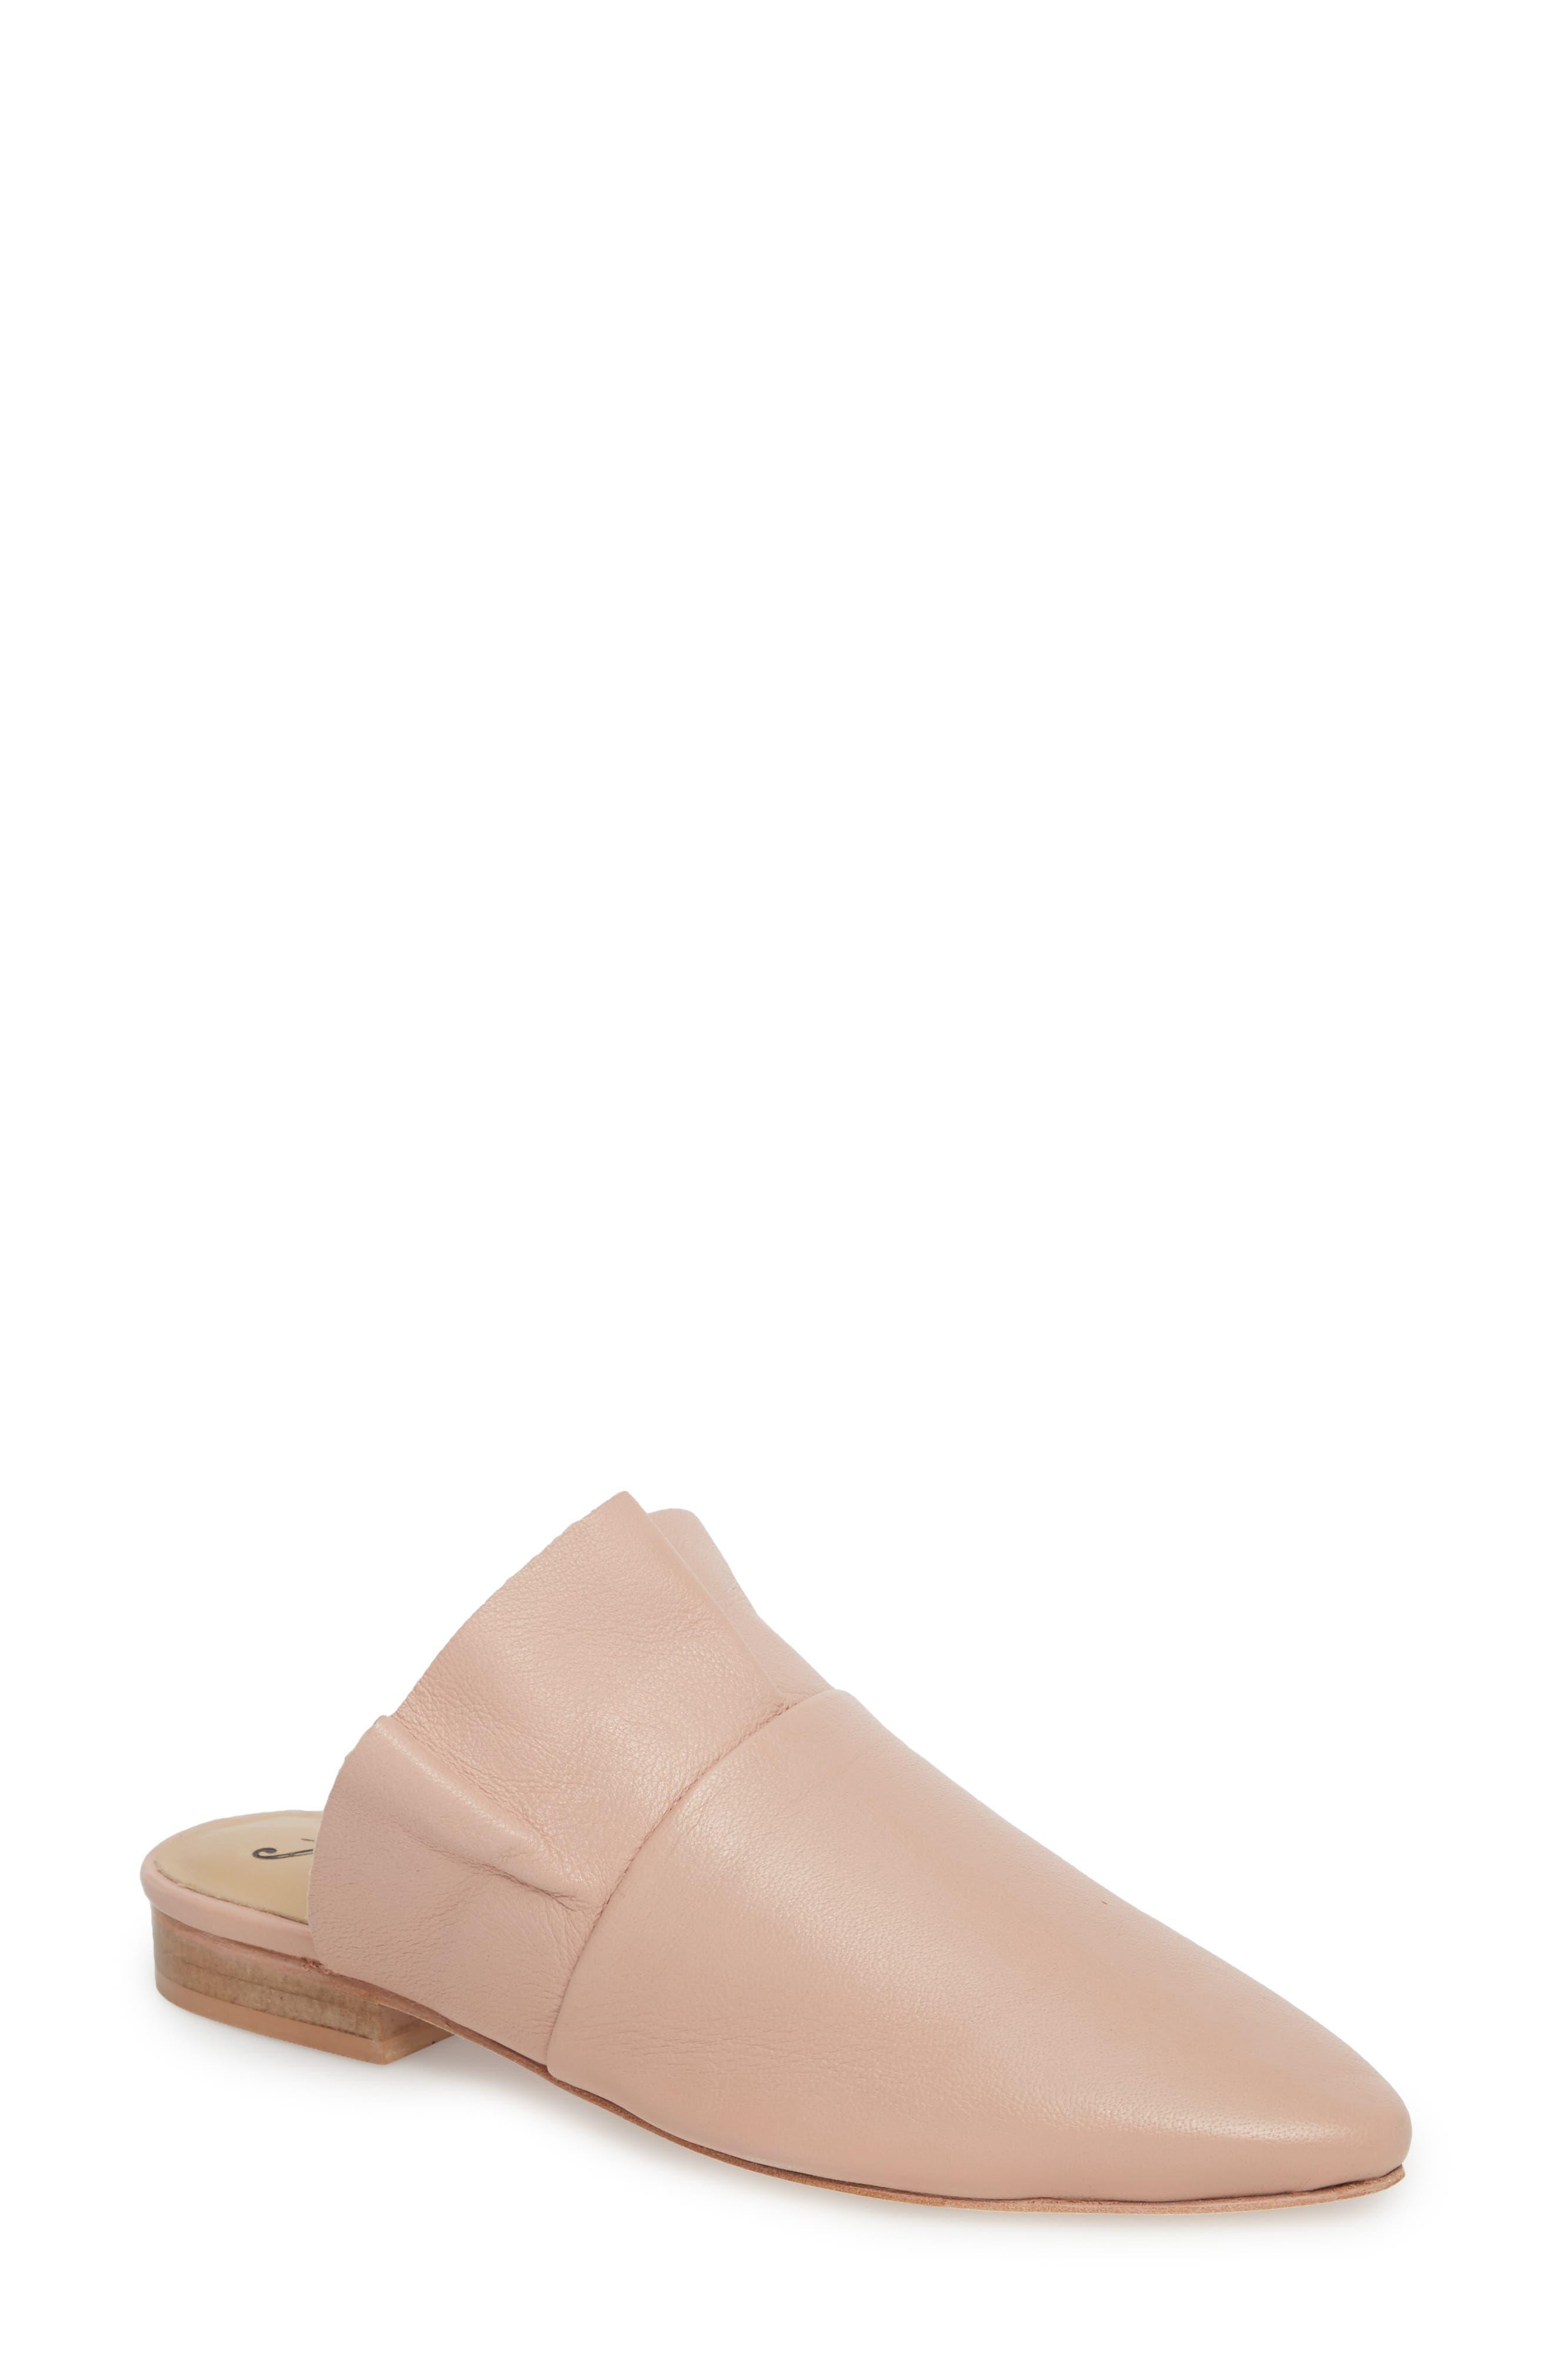 Sienna Ruffle Mule,                         Main,                         color, Pink